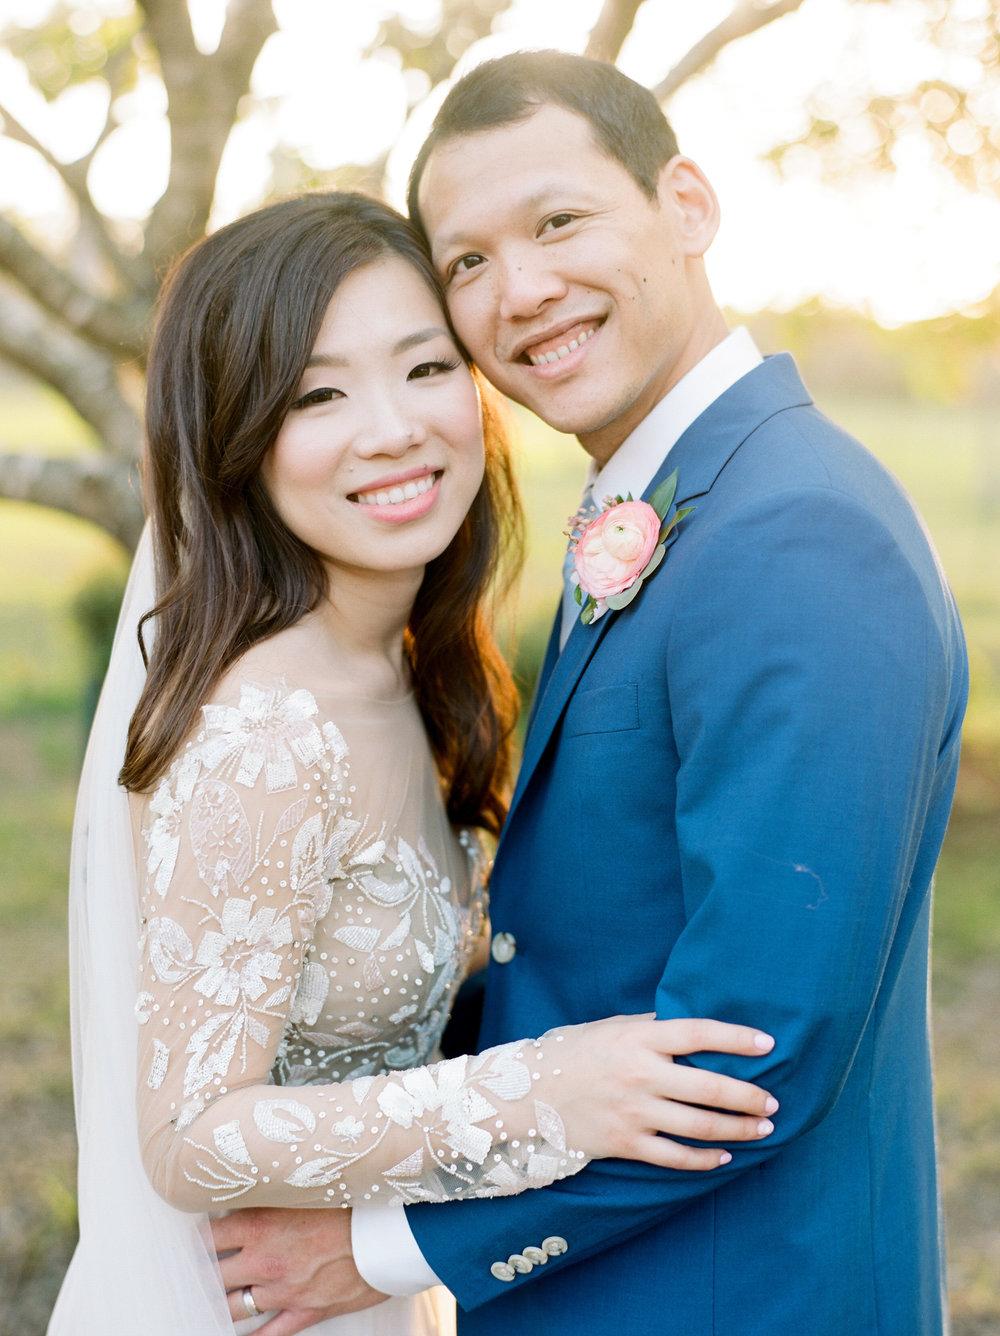 The-Knot-50-Weddings-50-States-Texas-Winner-Dana-Fernandez-photography-houston-wedding-photographer-film-fine-art-destination-21.jpg